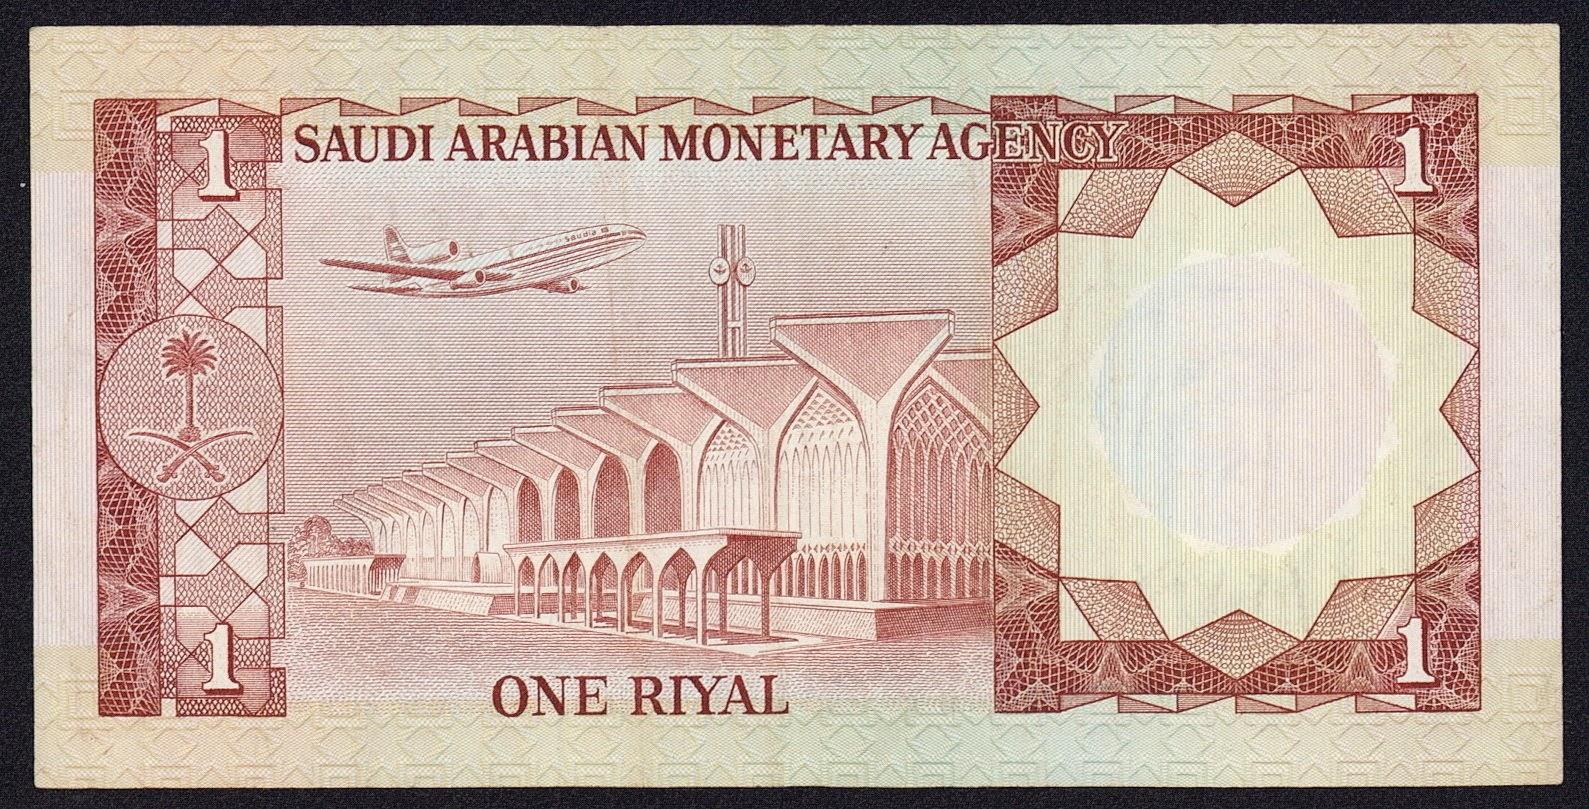 Saudi Arabia Banknotes One Saudi Riyal Note 1976 Dhahran Airport